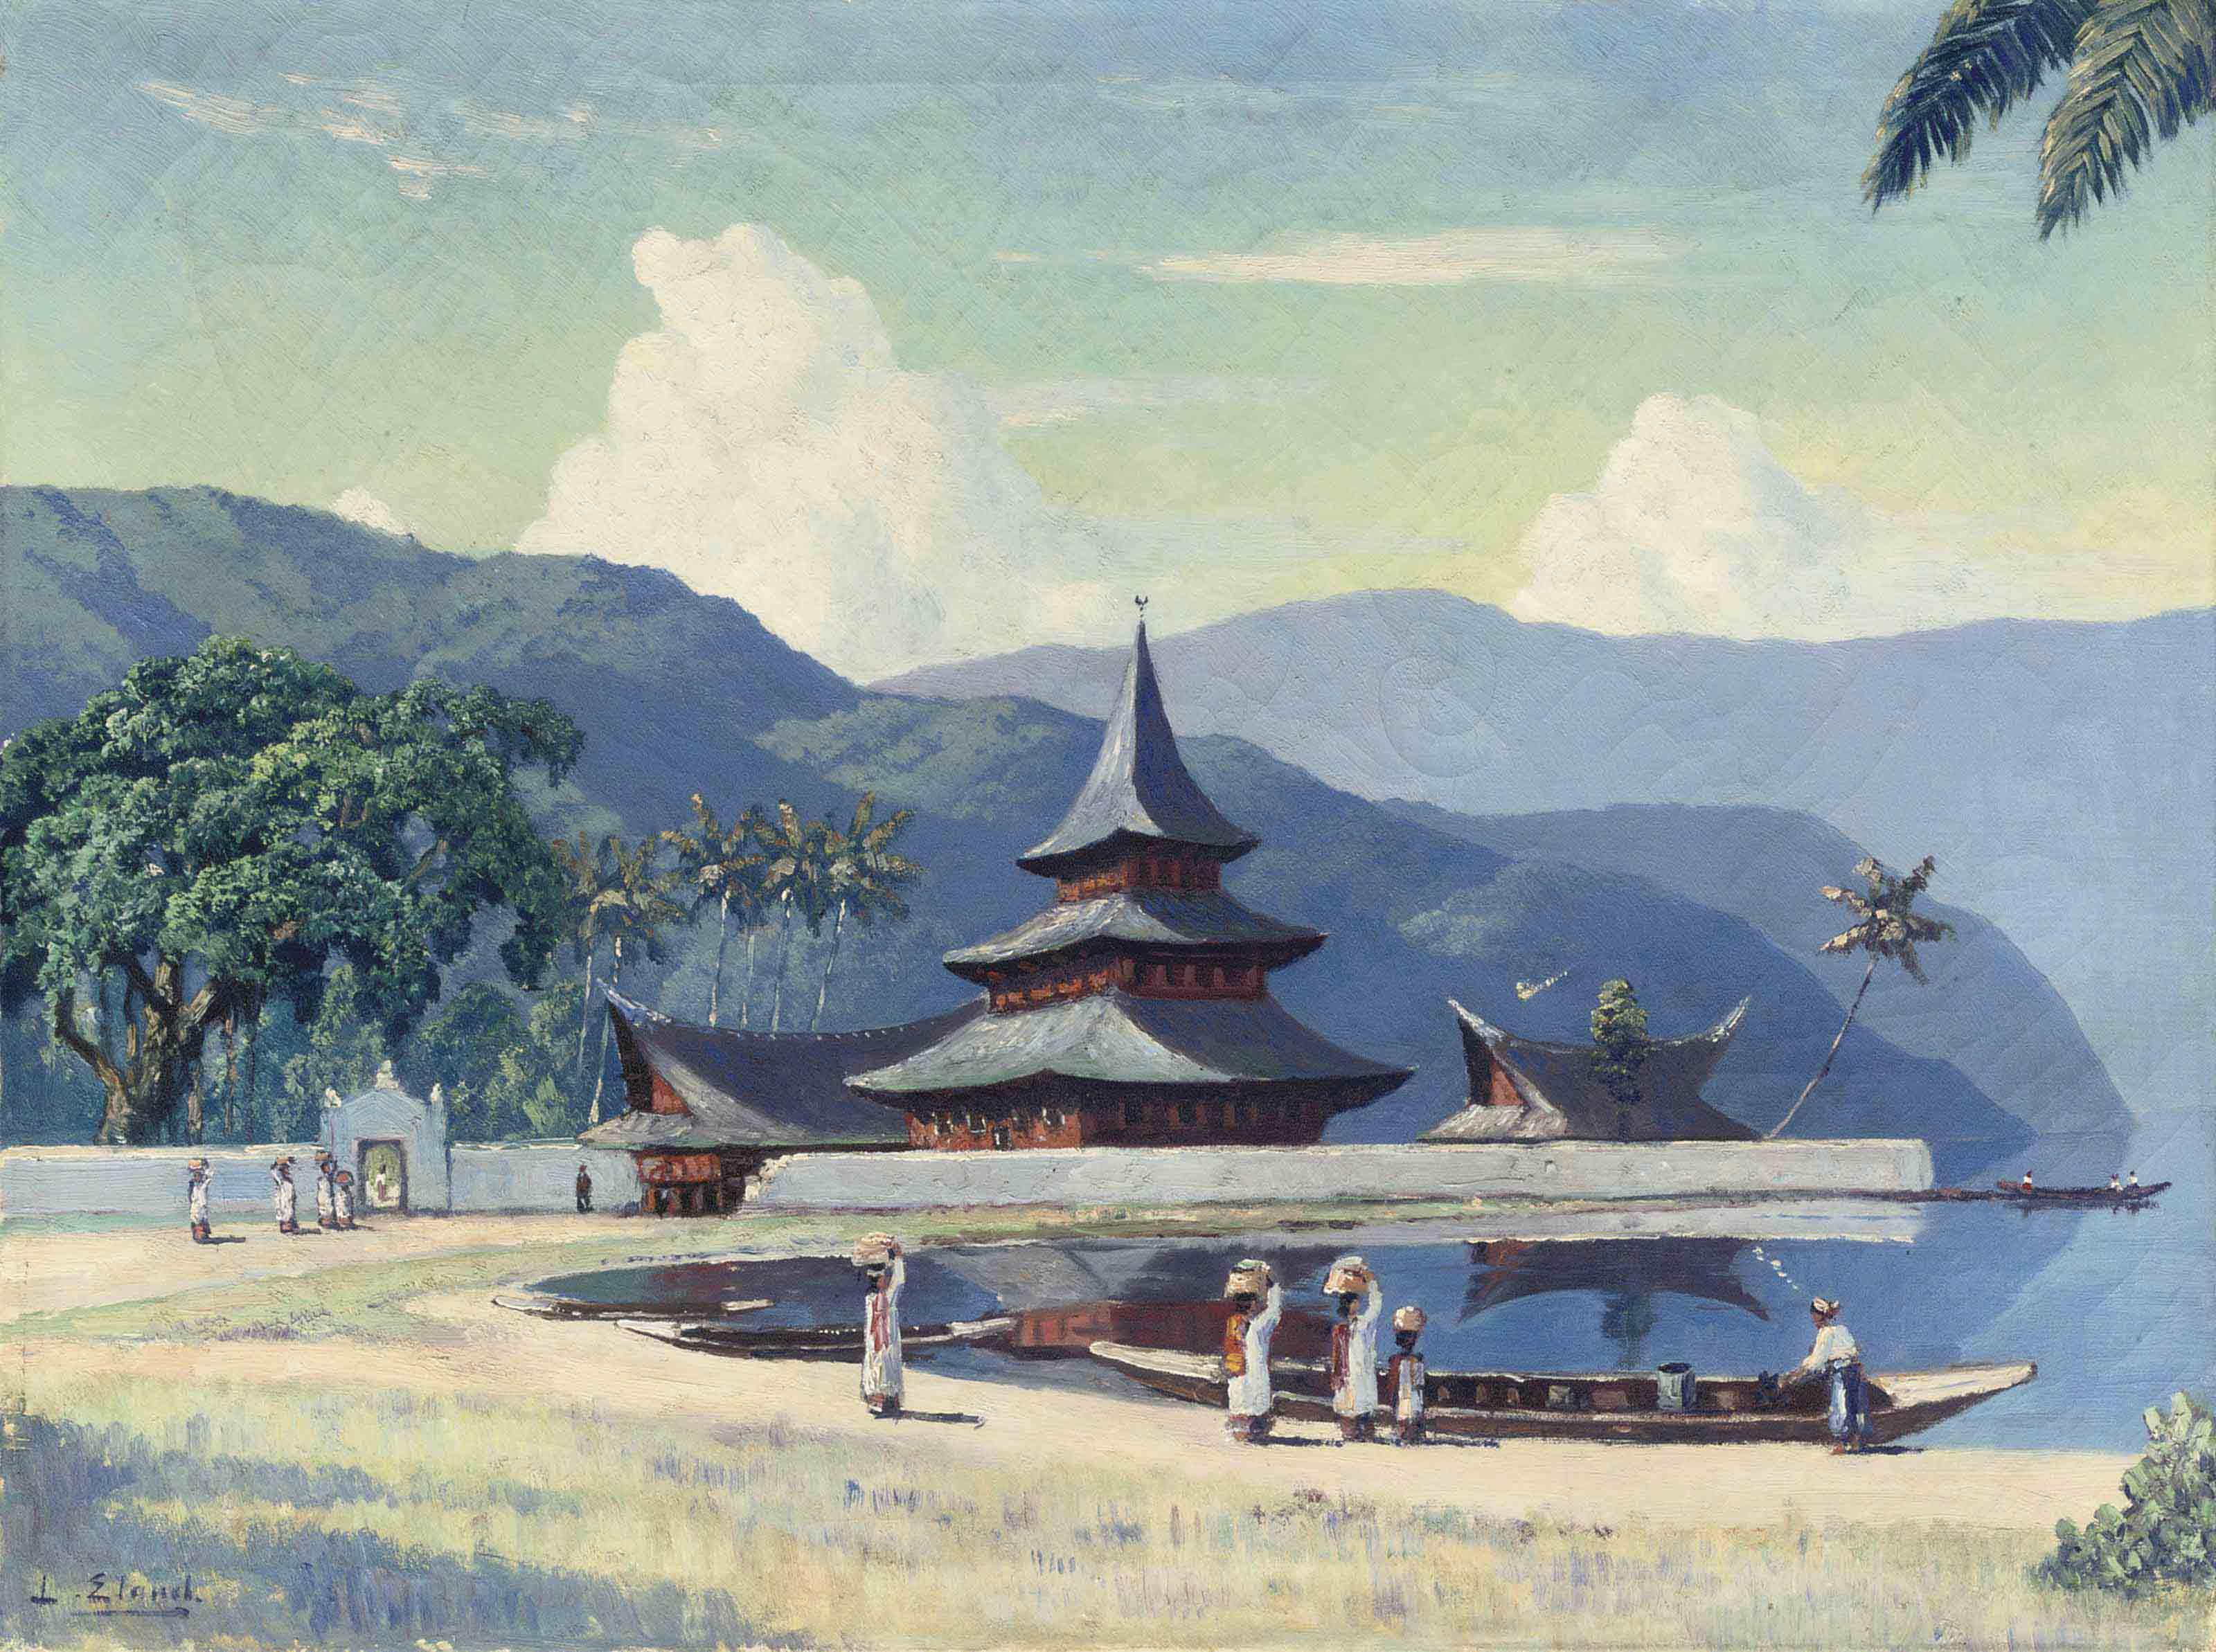 Daily life around the pagoda